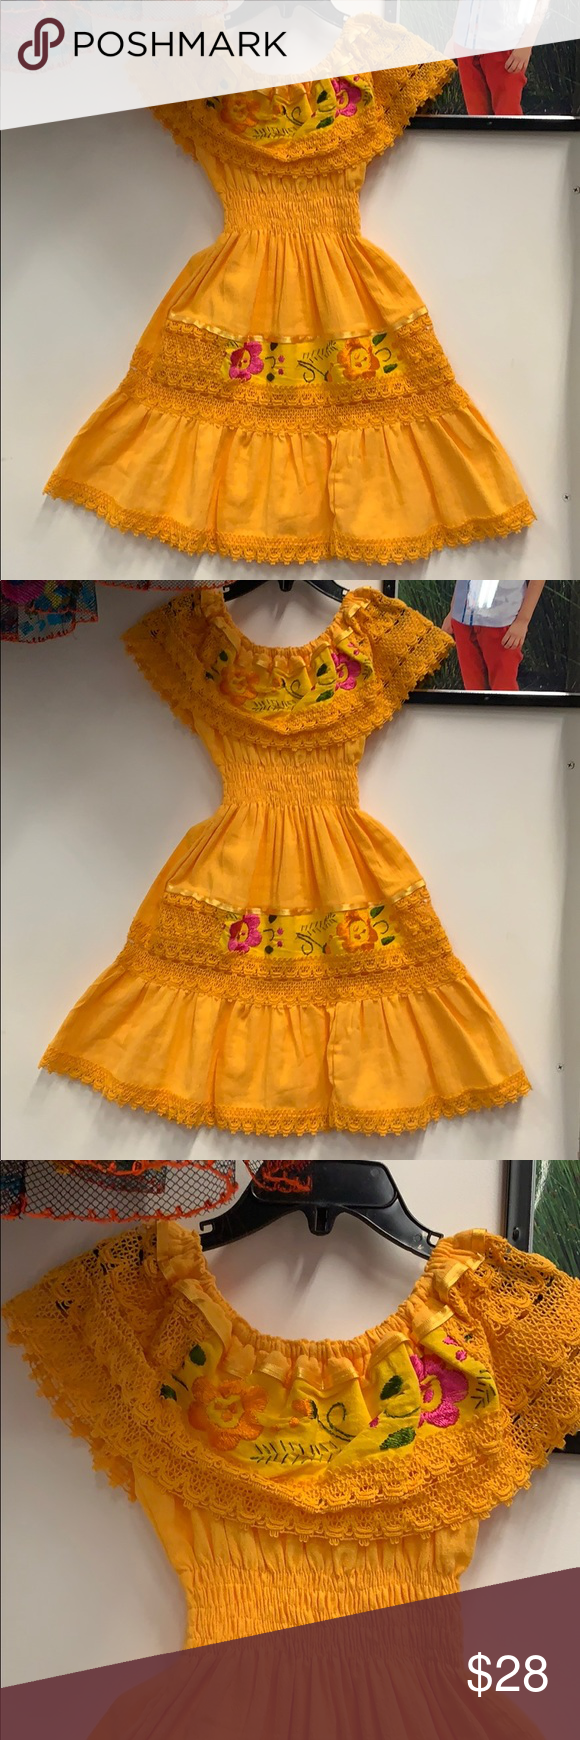 Yellow Size 4t Dress Boho Chic Dress Dresses 4t Dress [ 1740 x 580 Pixel ]